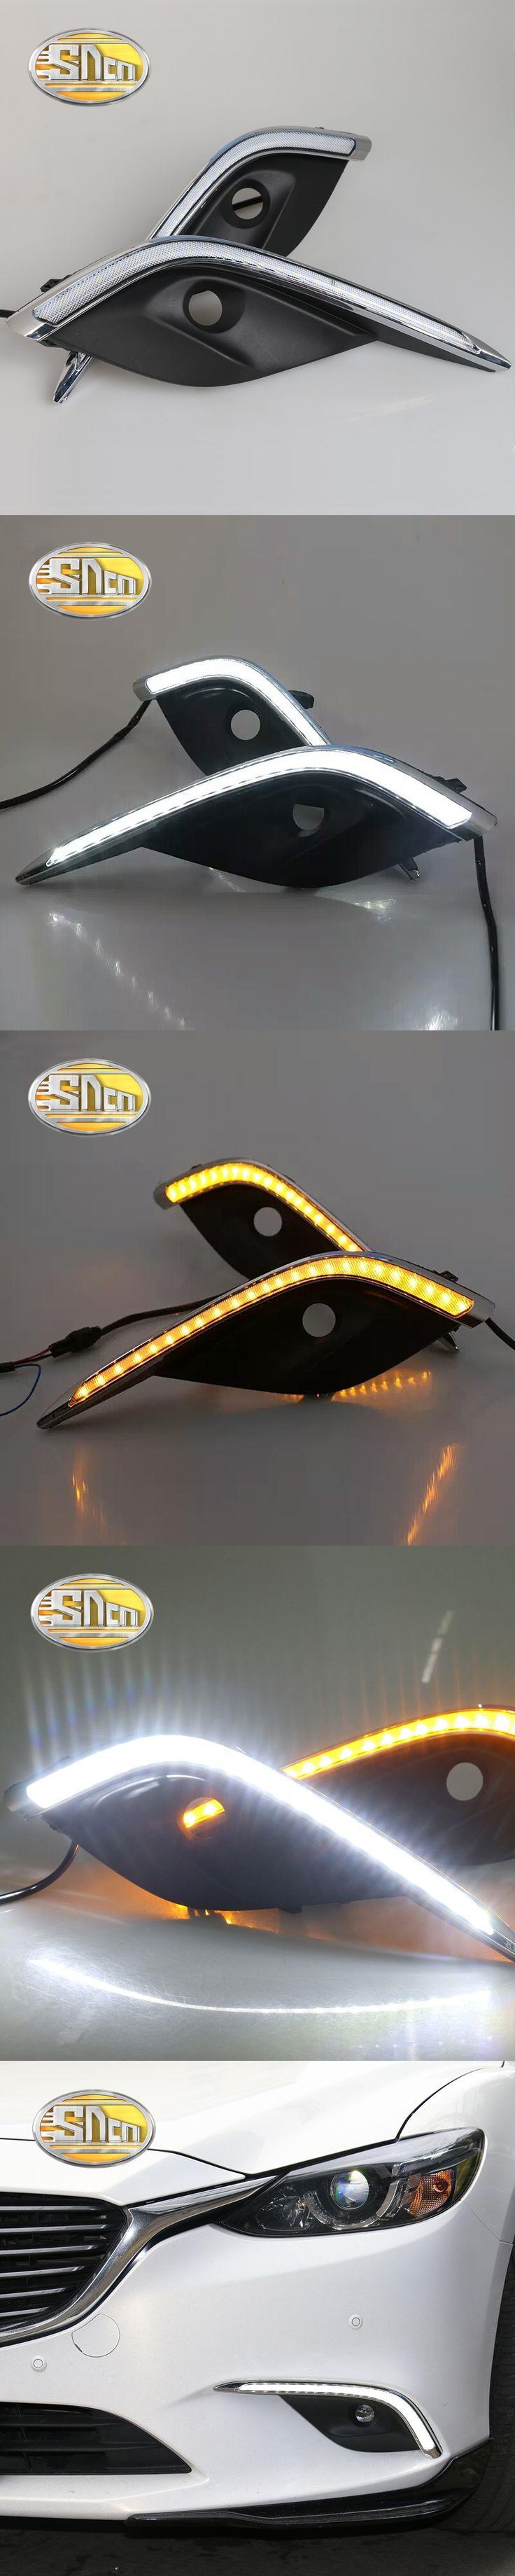 SNCN LED Daytime Running Light For Mazda 6 2016 2017,Car Accessories Waterproof ABS 12V DRL Fog Lamp Decoration